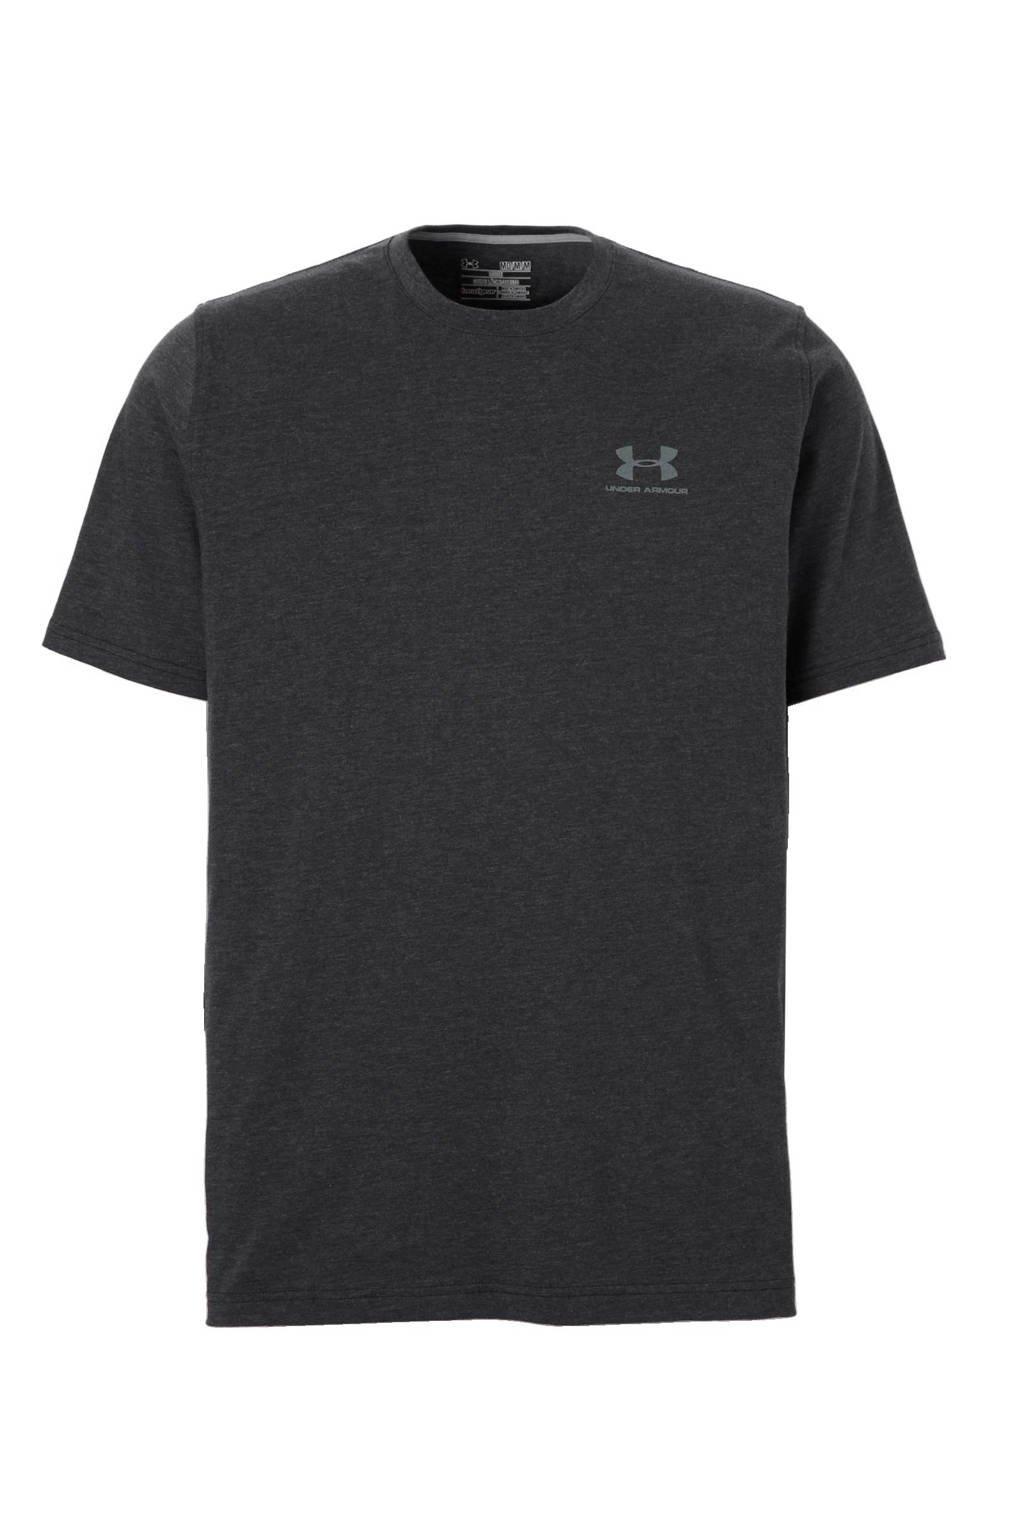 Under Armour   sport T-shirt, Antraciet